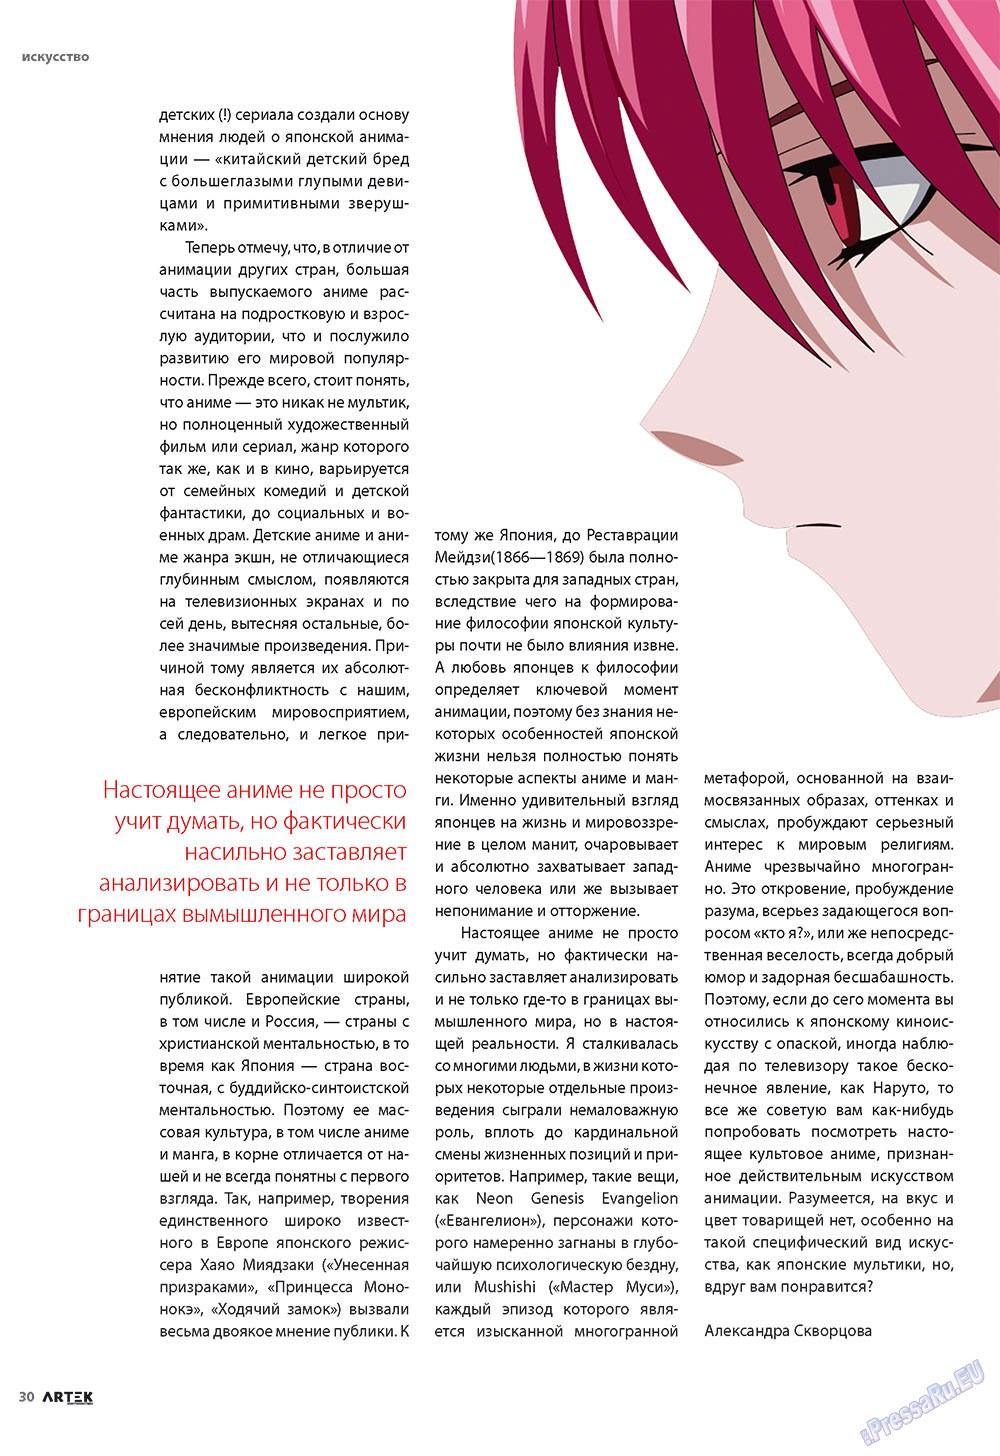 Артек (журнал). 2009 год, номер 5, стр. 30